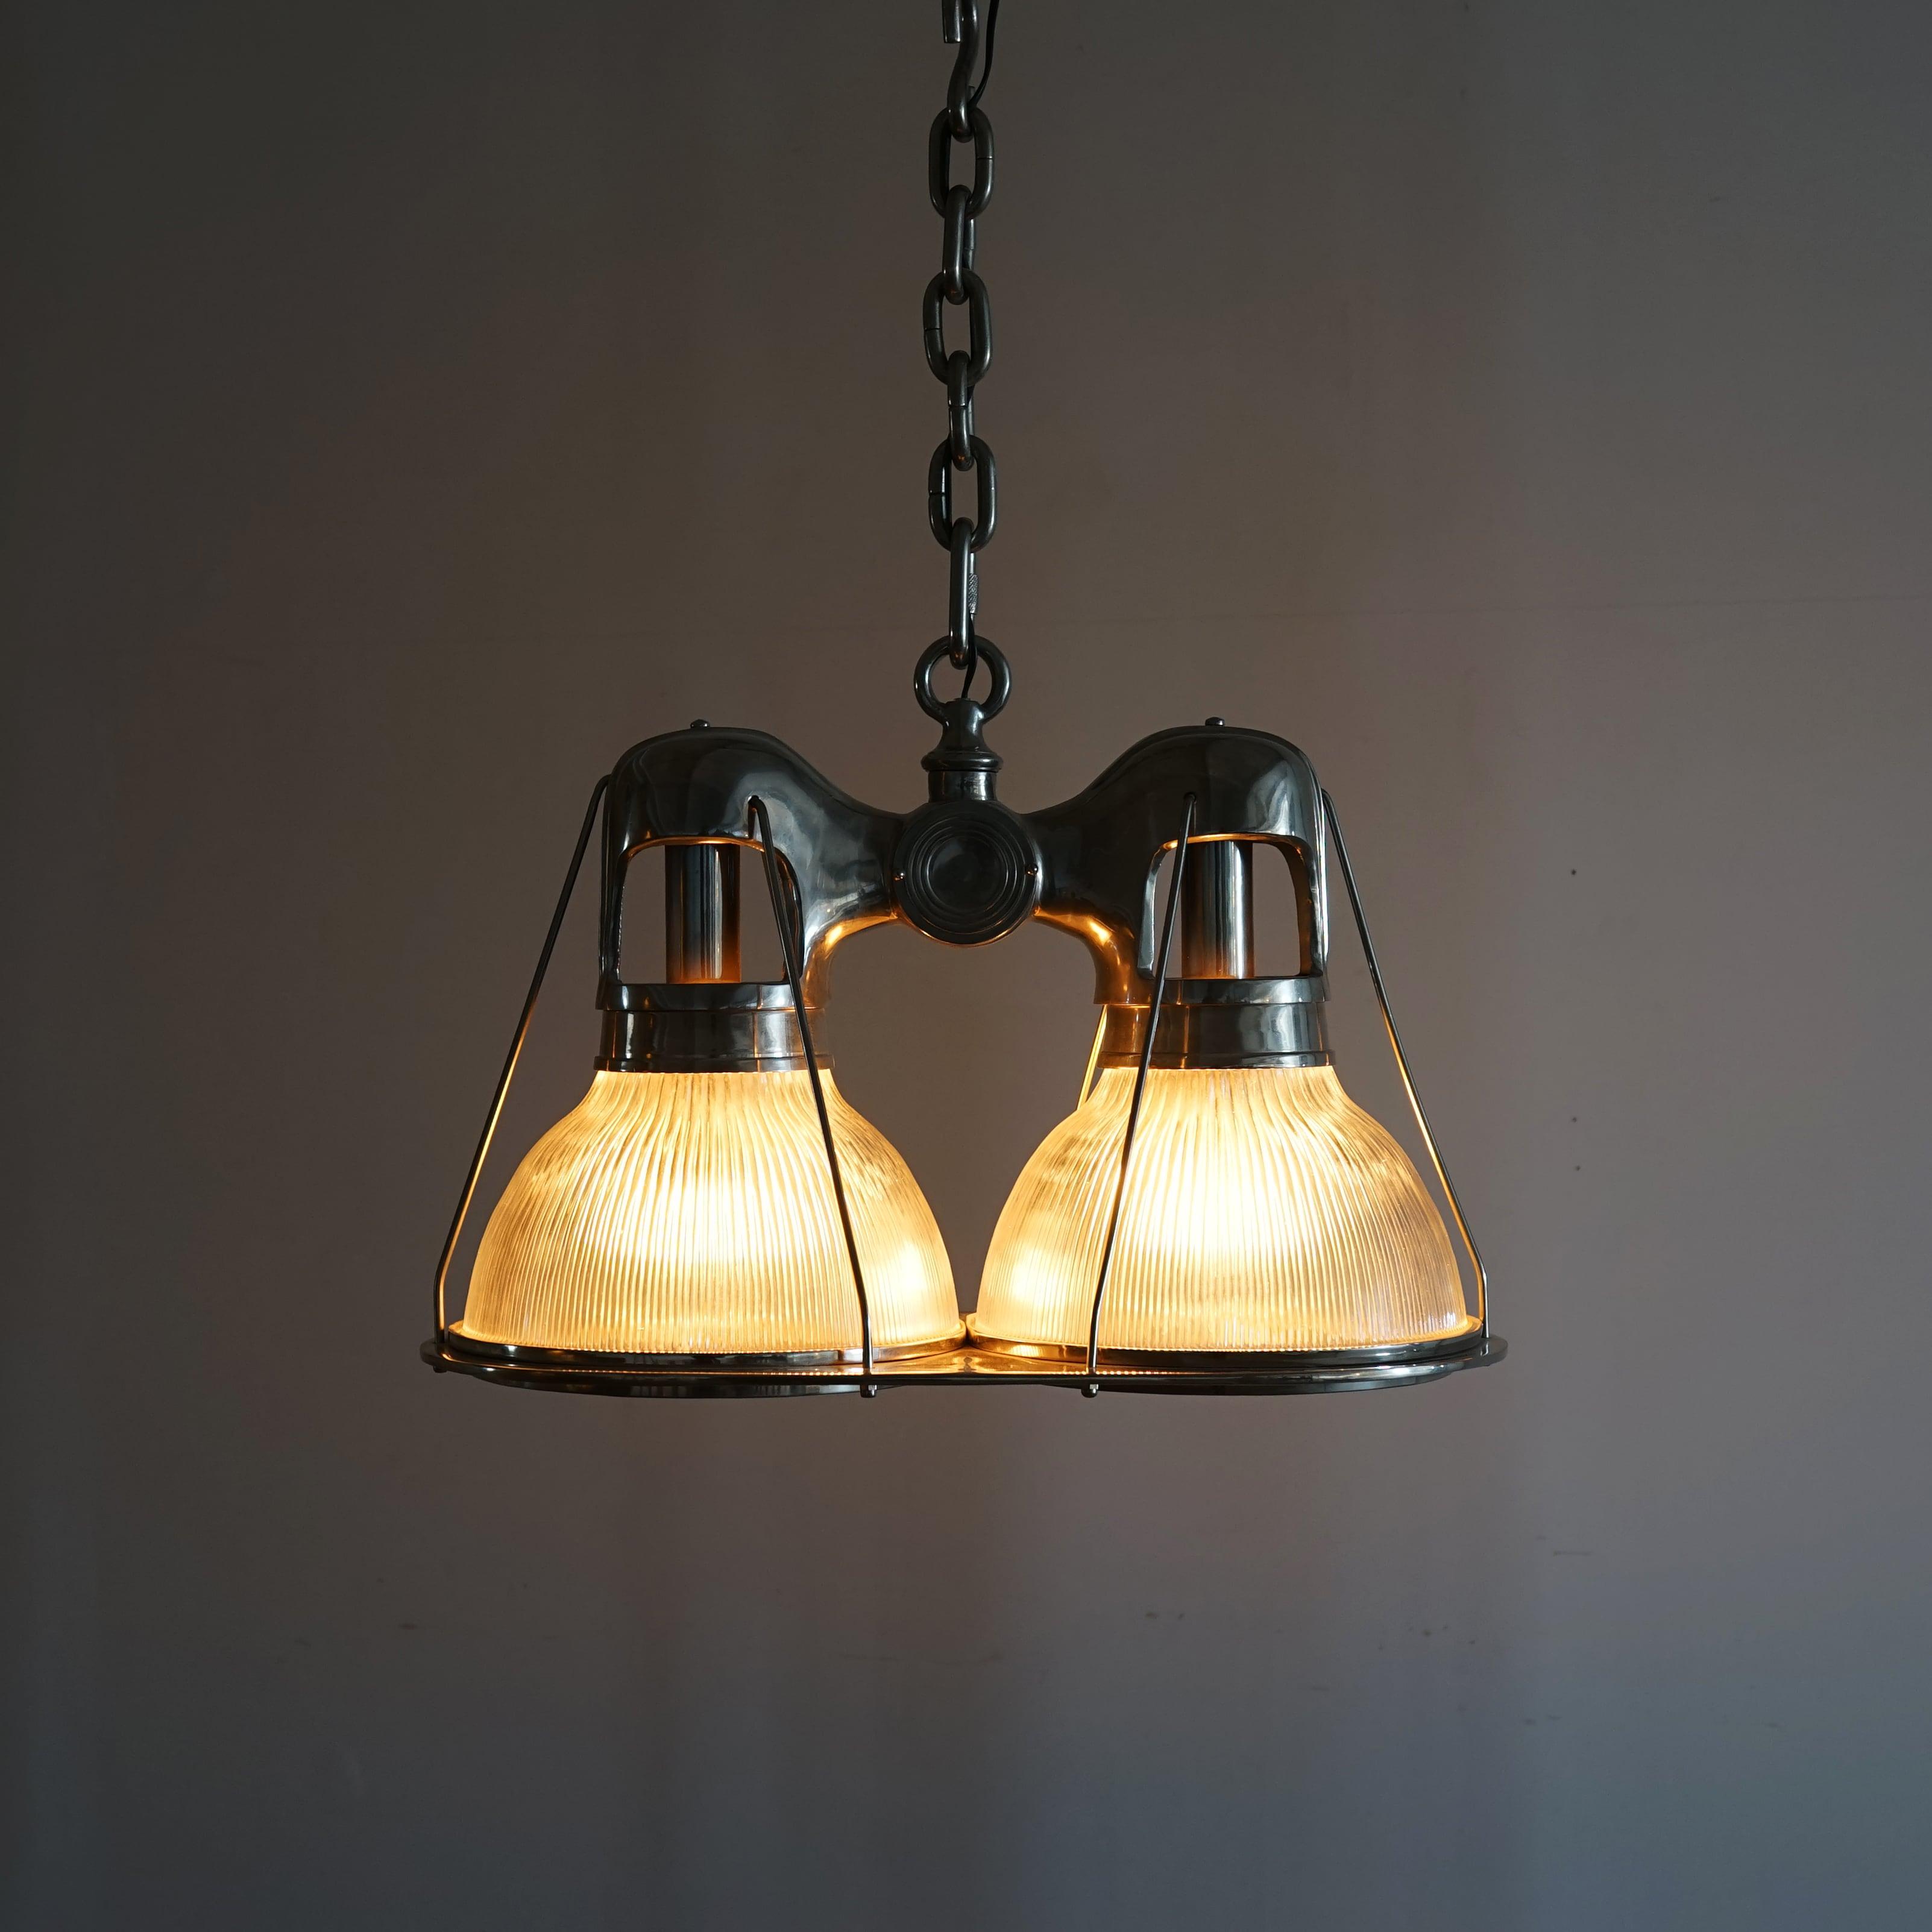 #01-16 Holophane Industrial Pendant Lamp